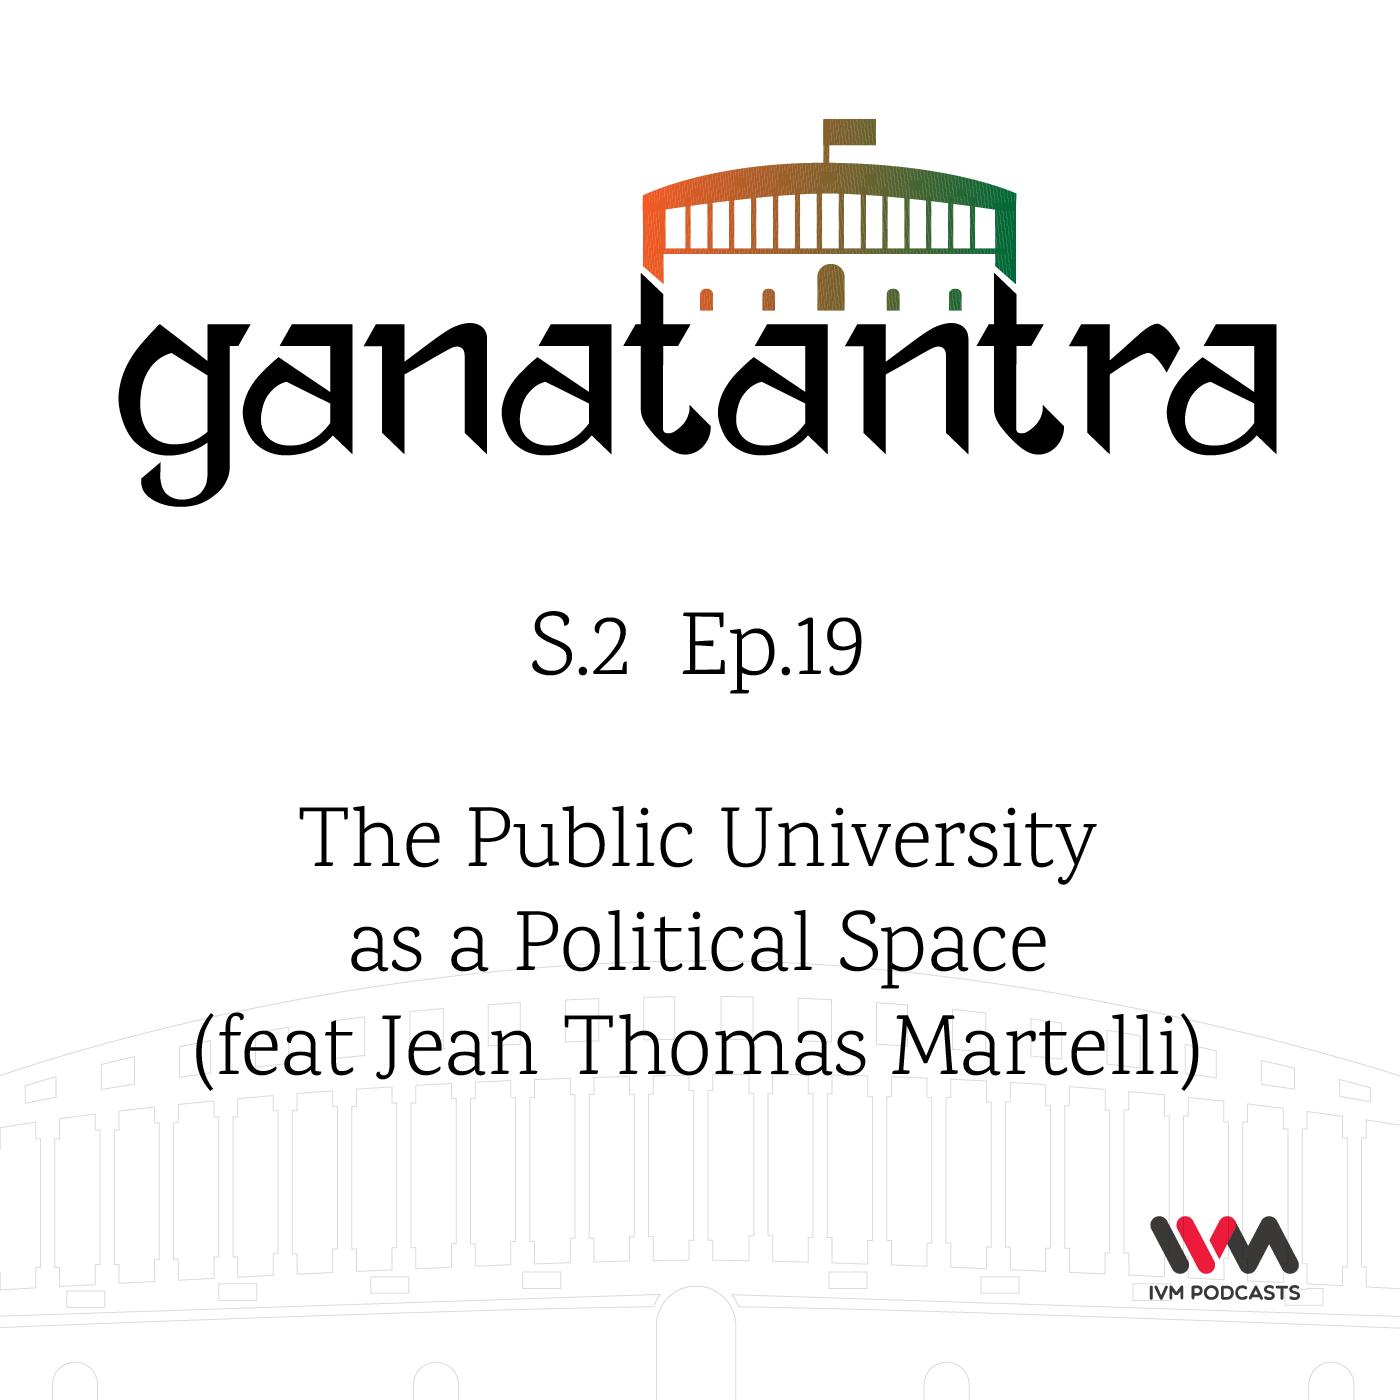 S02 E19: The Public University as a Political Space (feat Jean Thomas Martelli)